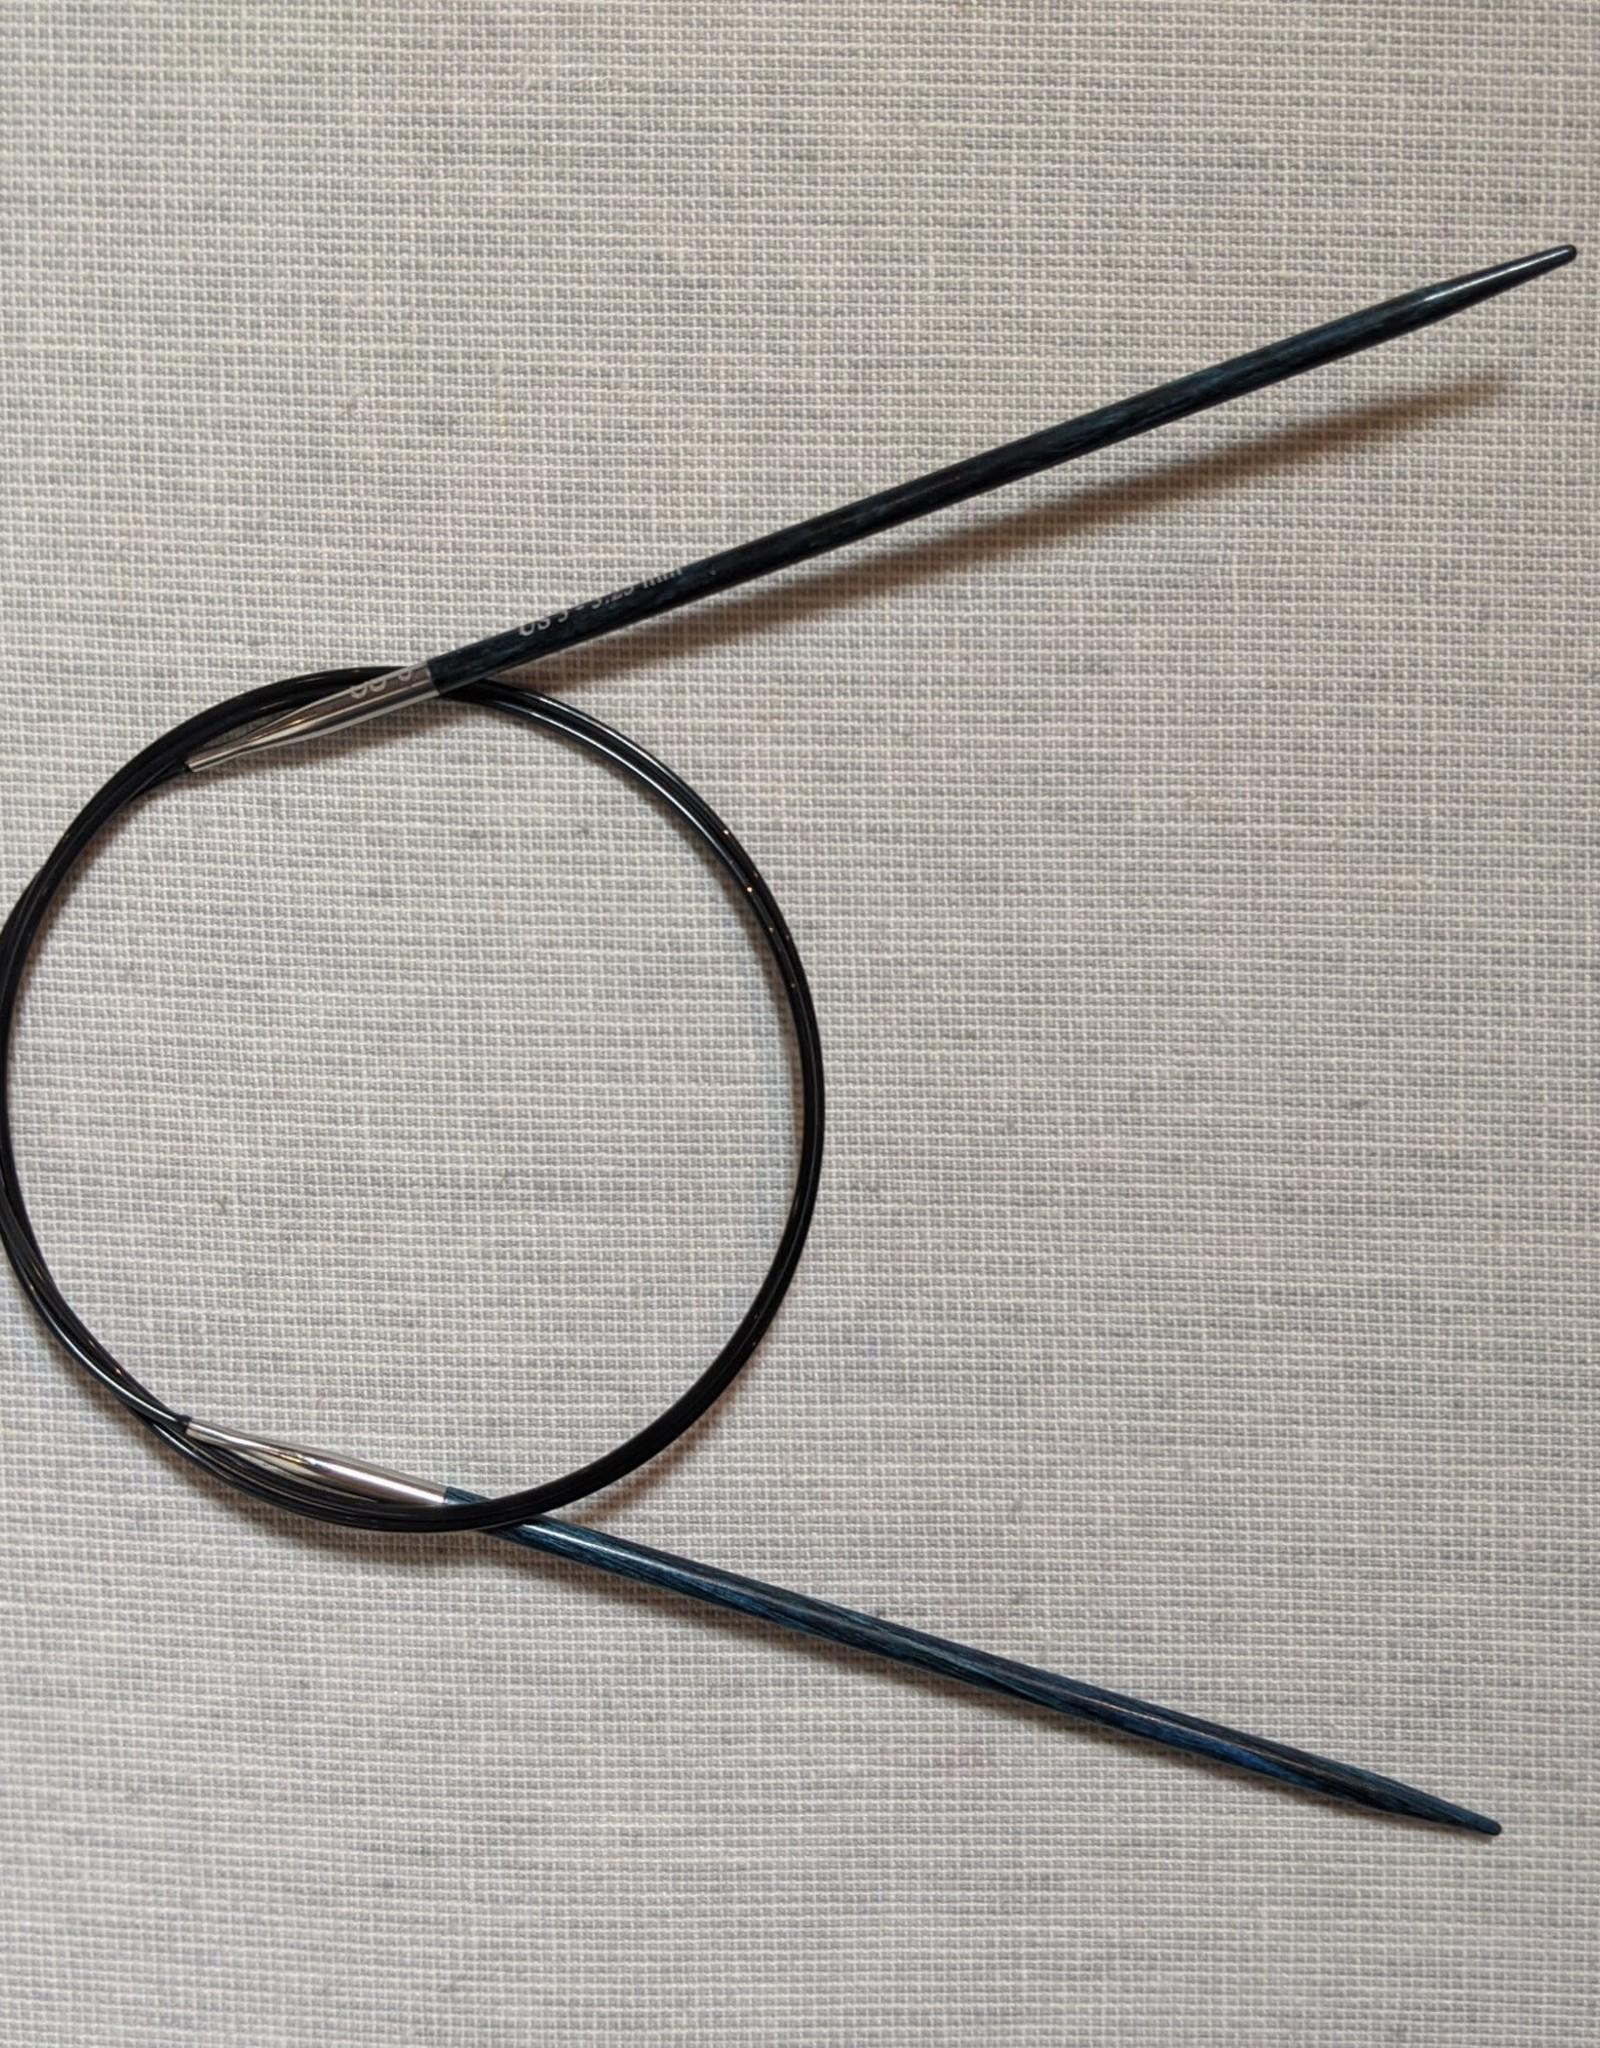 Knitter's Pride Dreamz Circular Needles